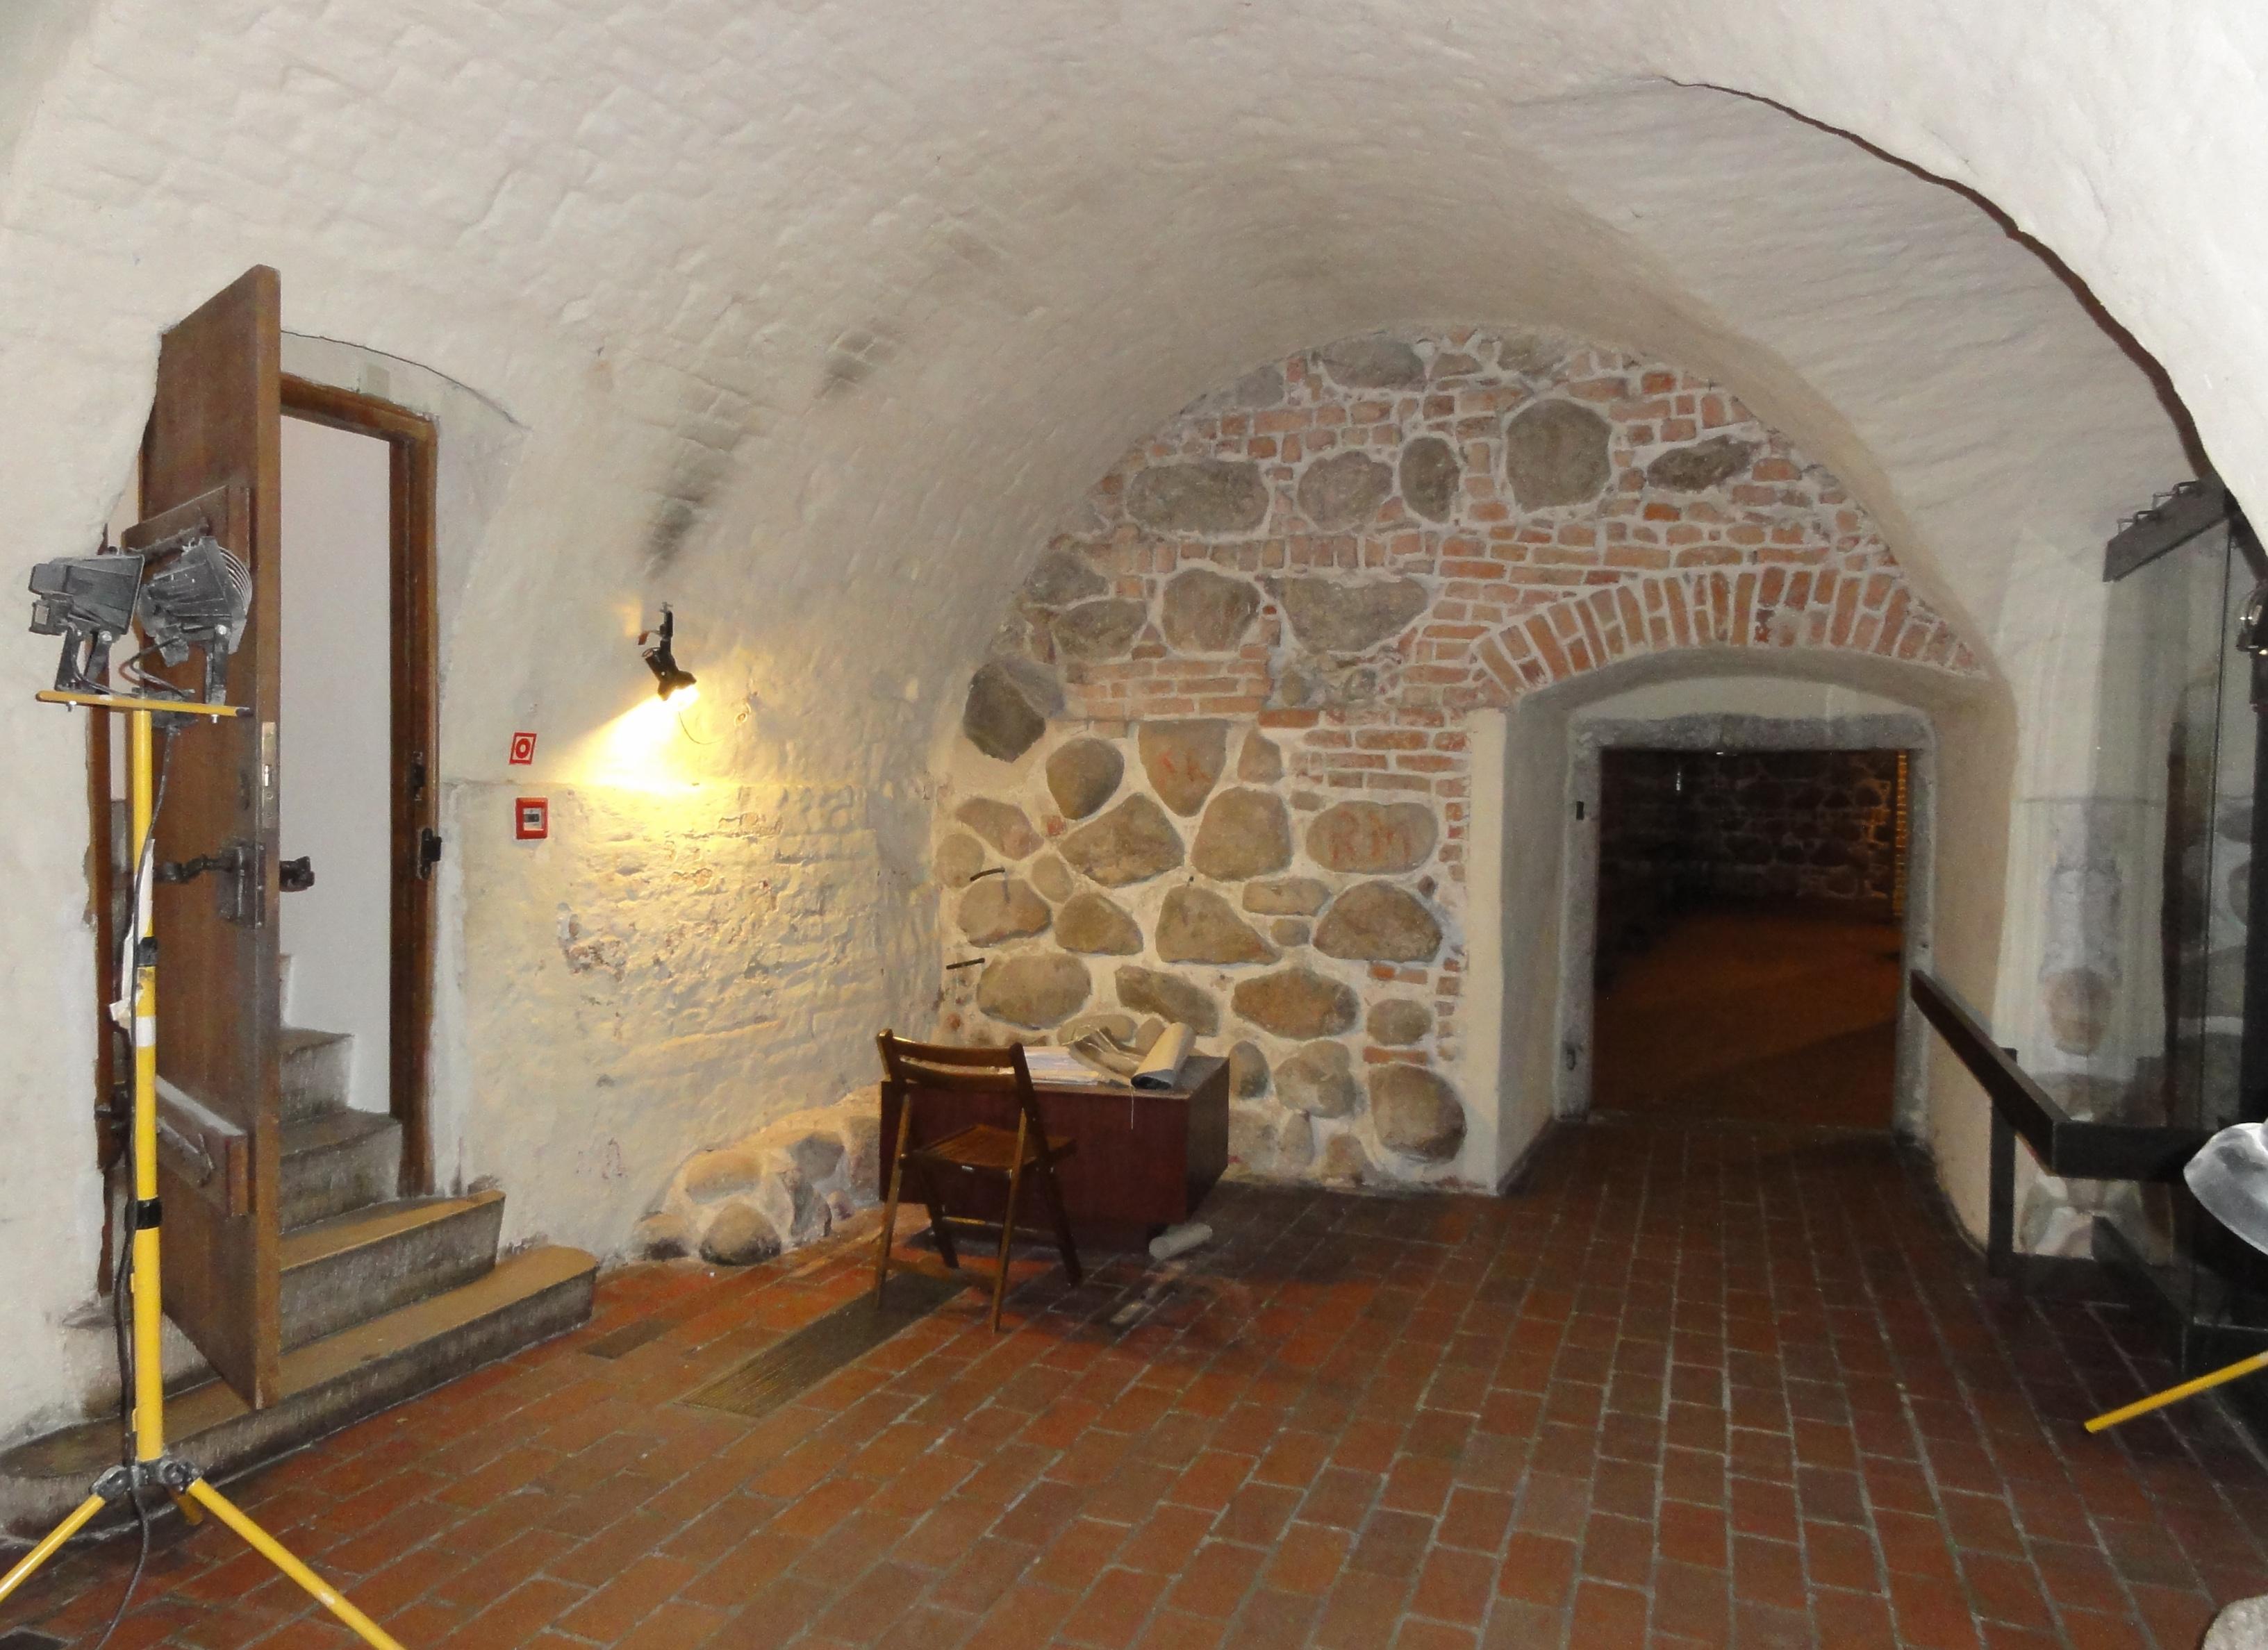 file hidden room of the castle of warsaw 8121472589 jpg rh commons wikimedia org